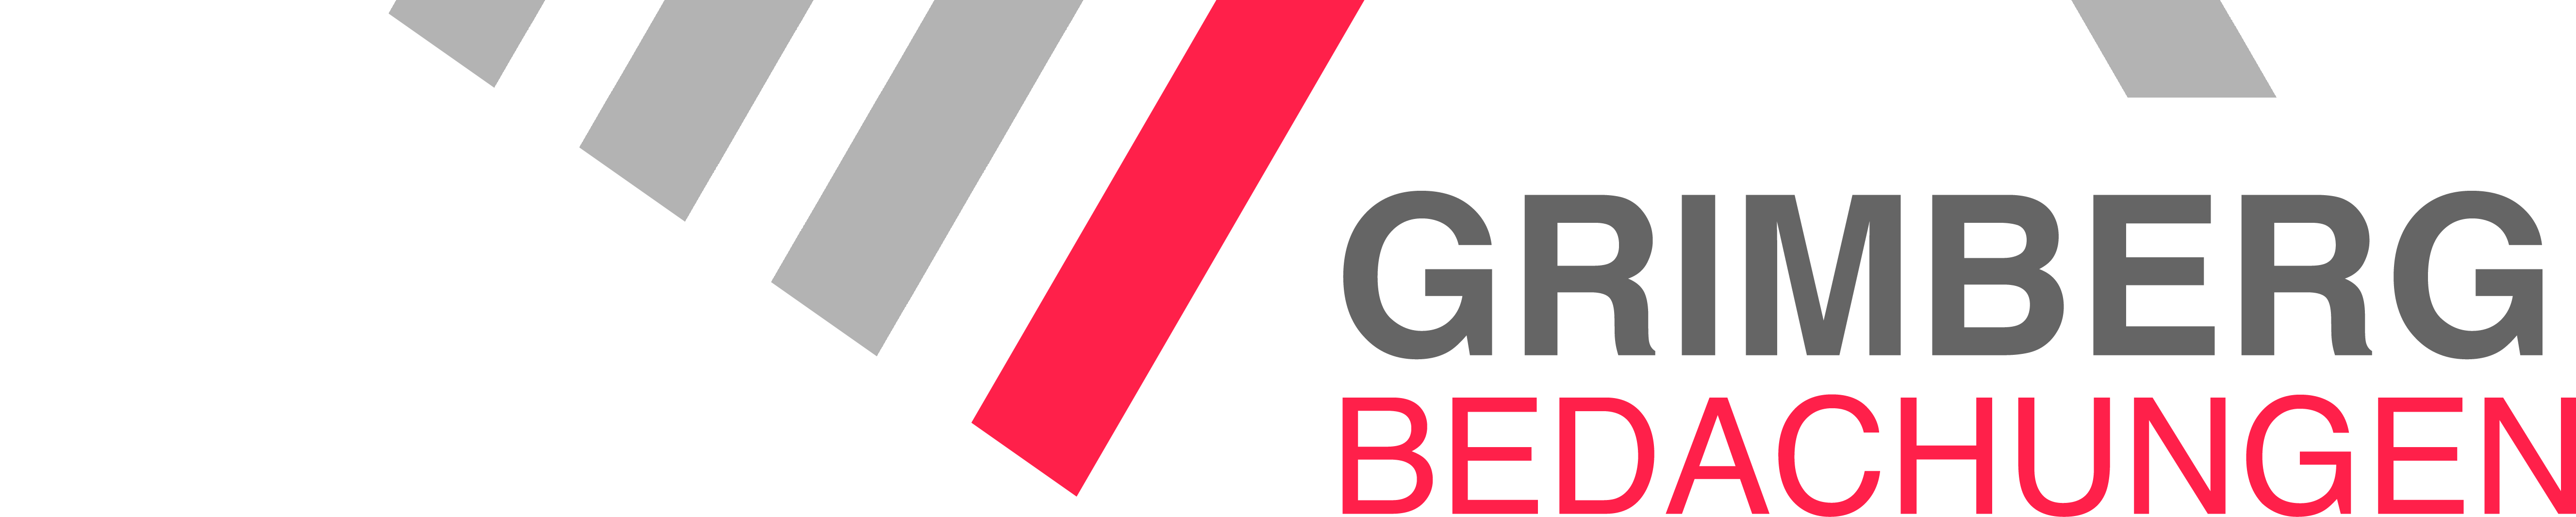 Grimberg Bedachungen